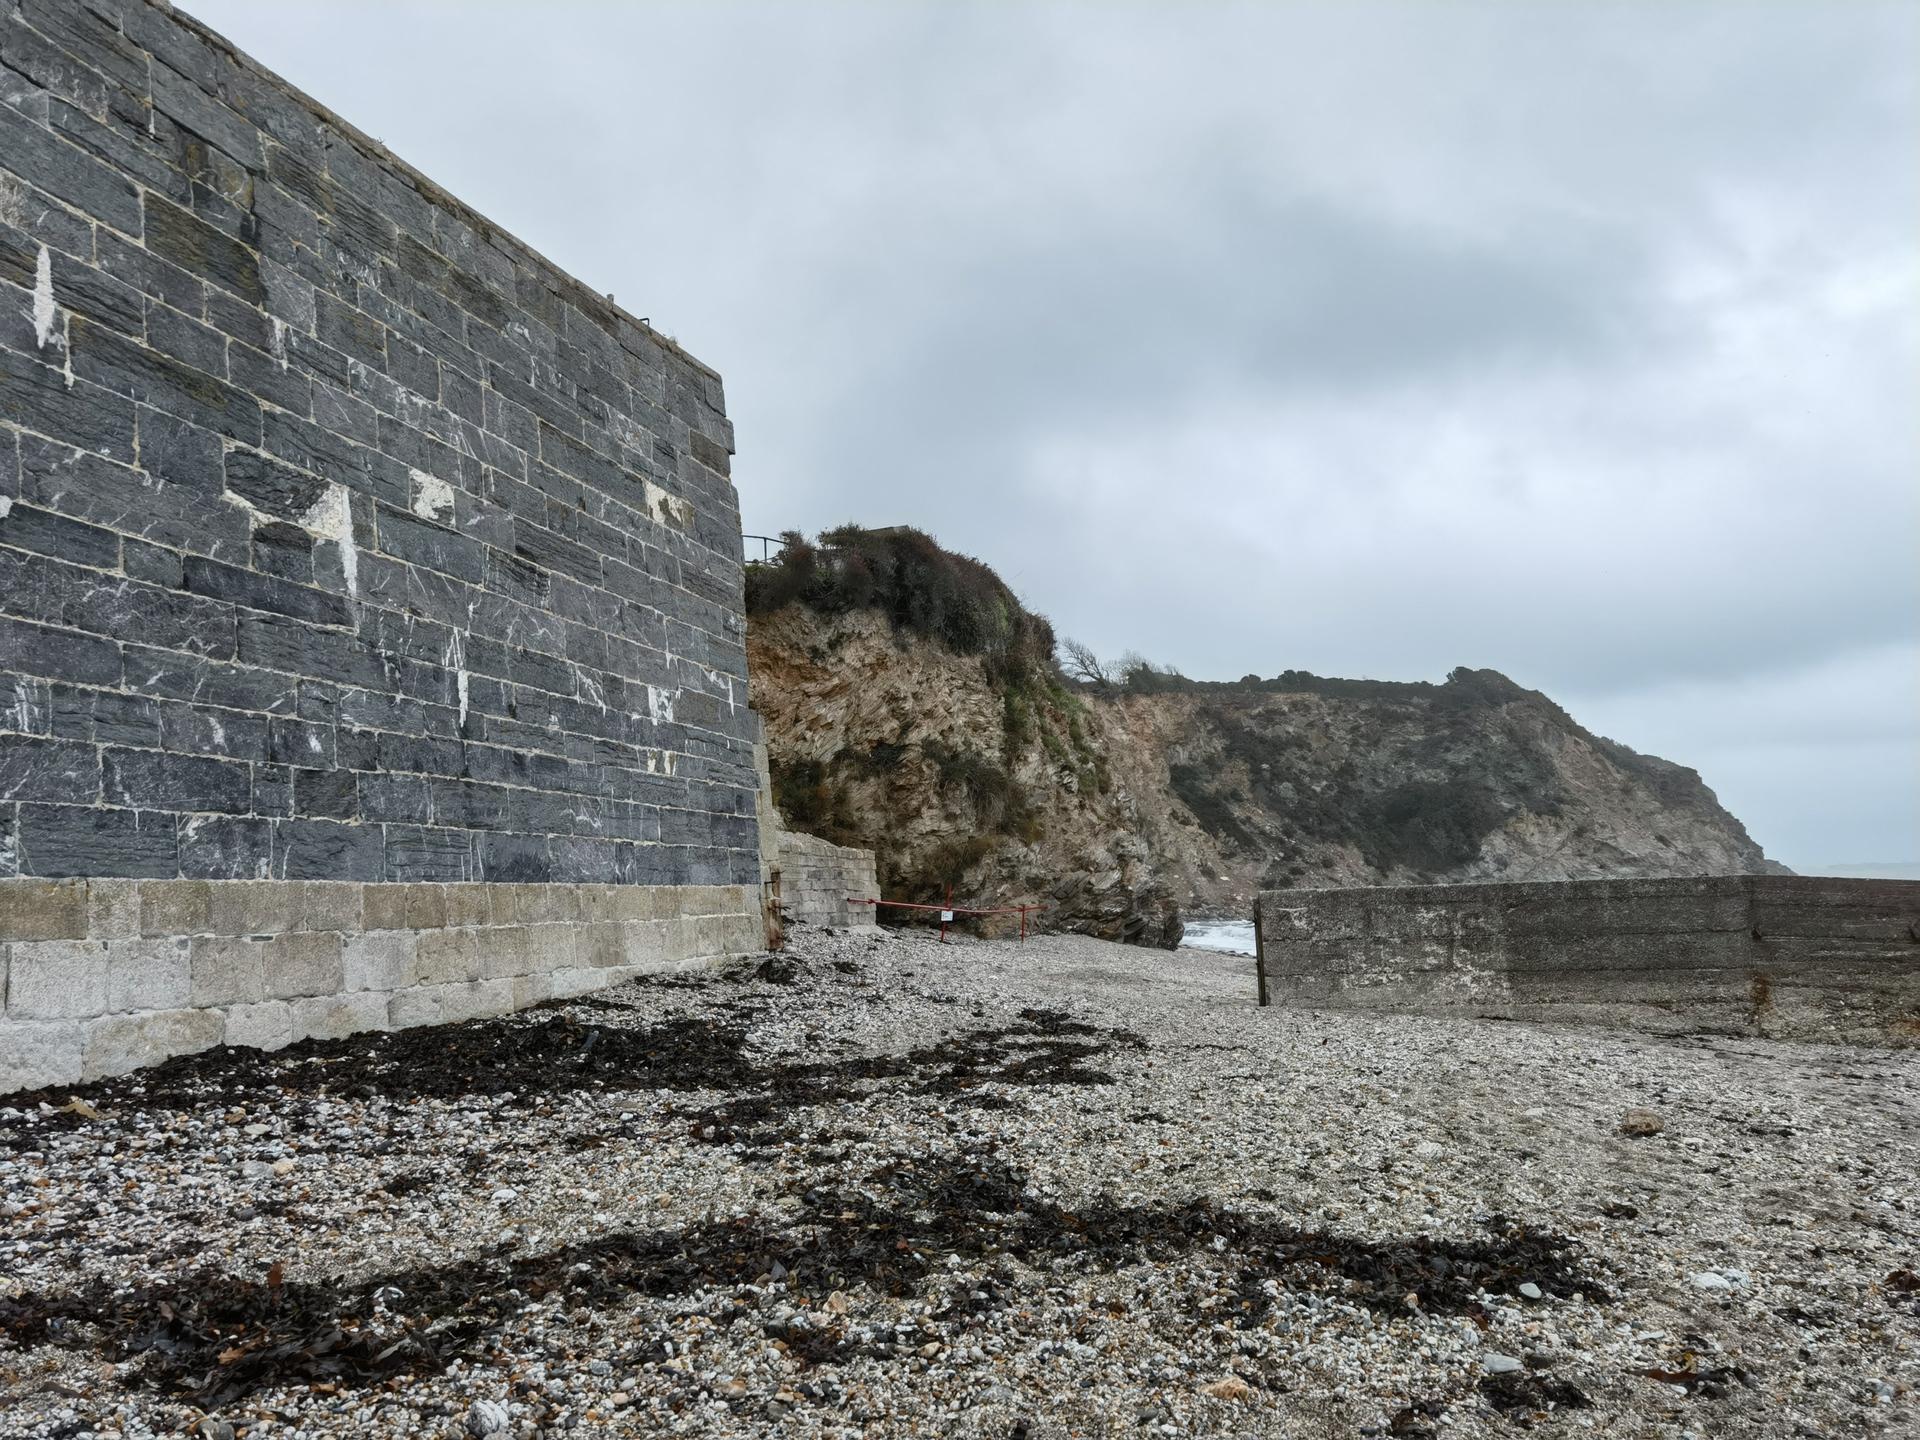 Huawei Mate 40 Pro photo sample of a beach